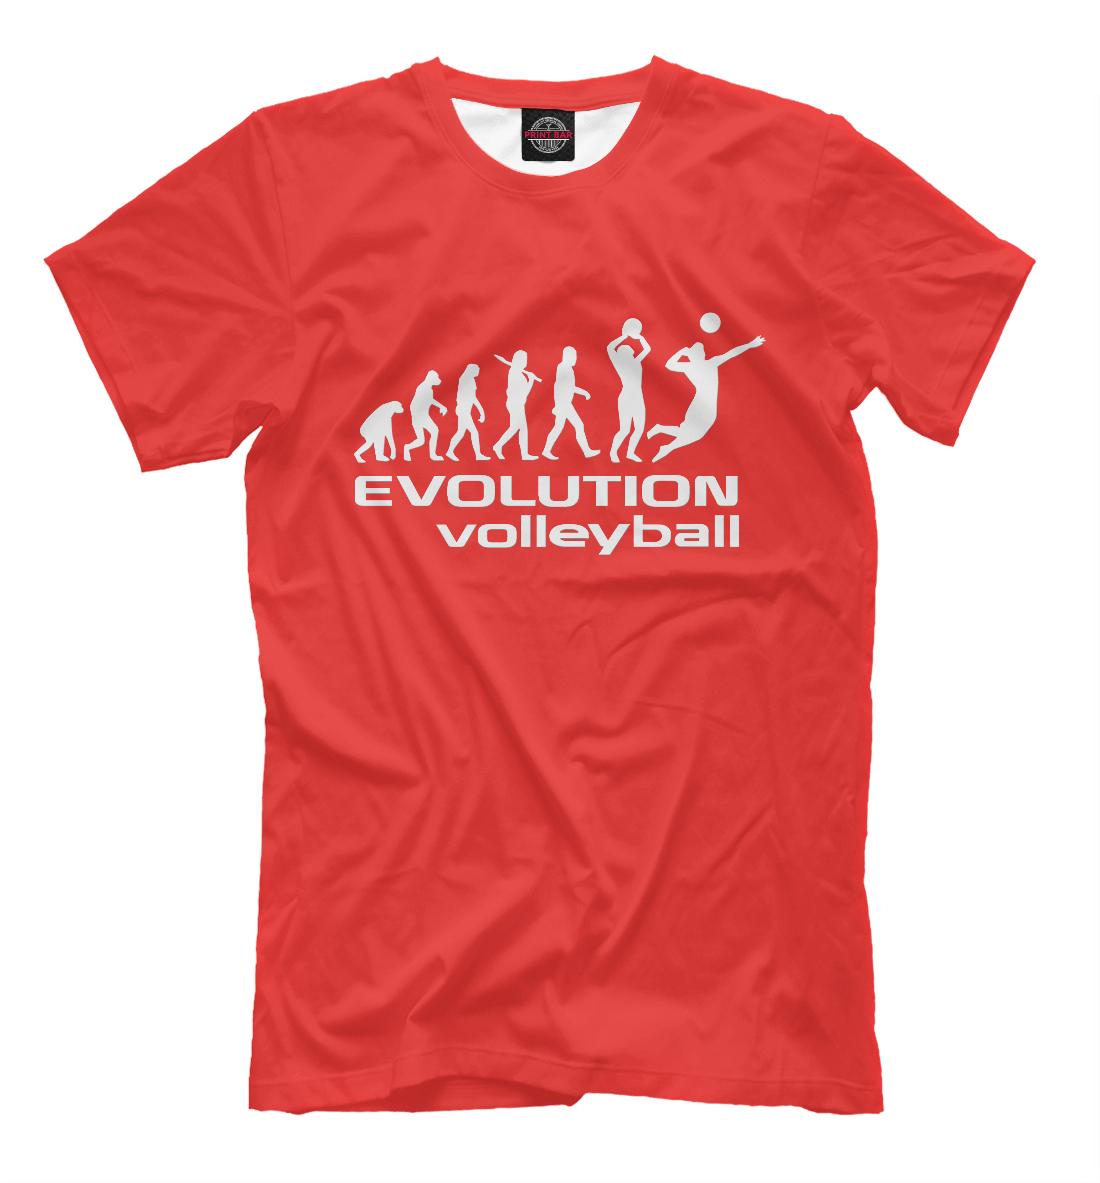 Evolution (volleyball), Printbar, Футболки, VLB-532402-fut-2  - купить со скидкой